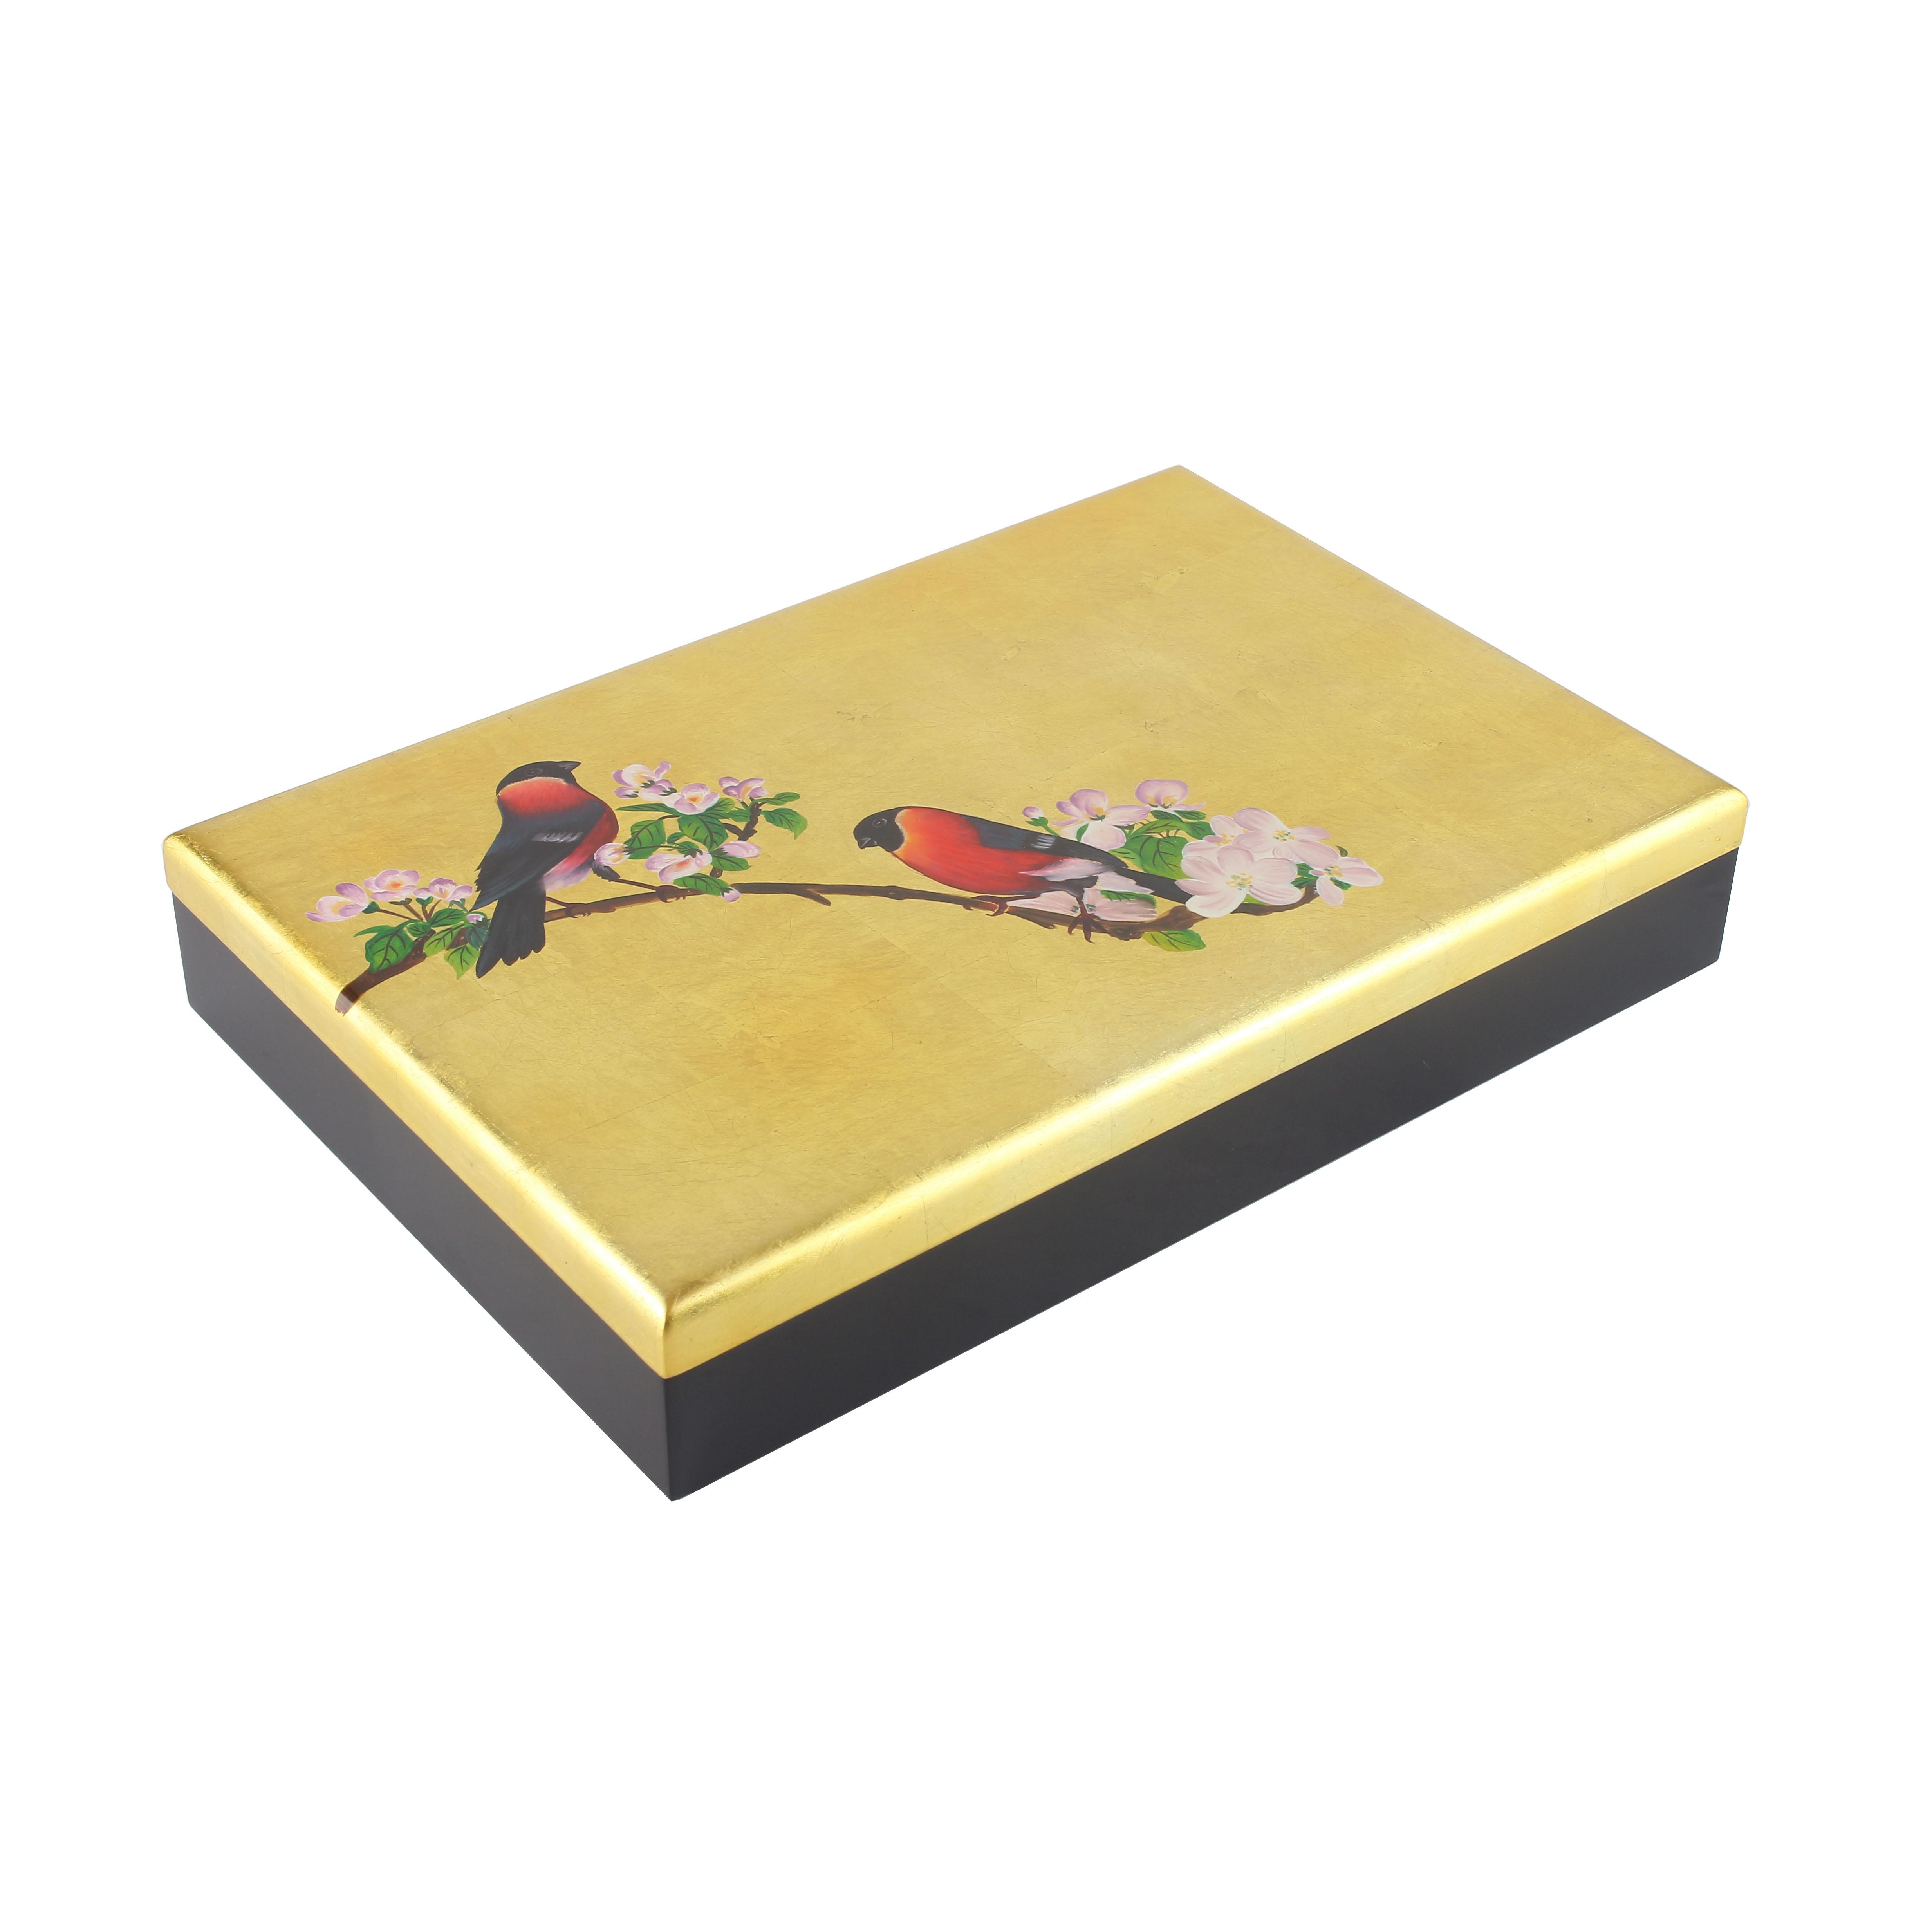 Handpainted Gold Inlay Box